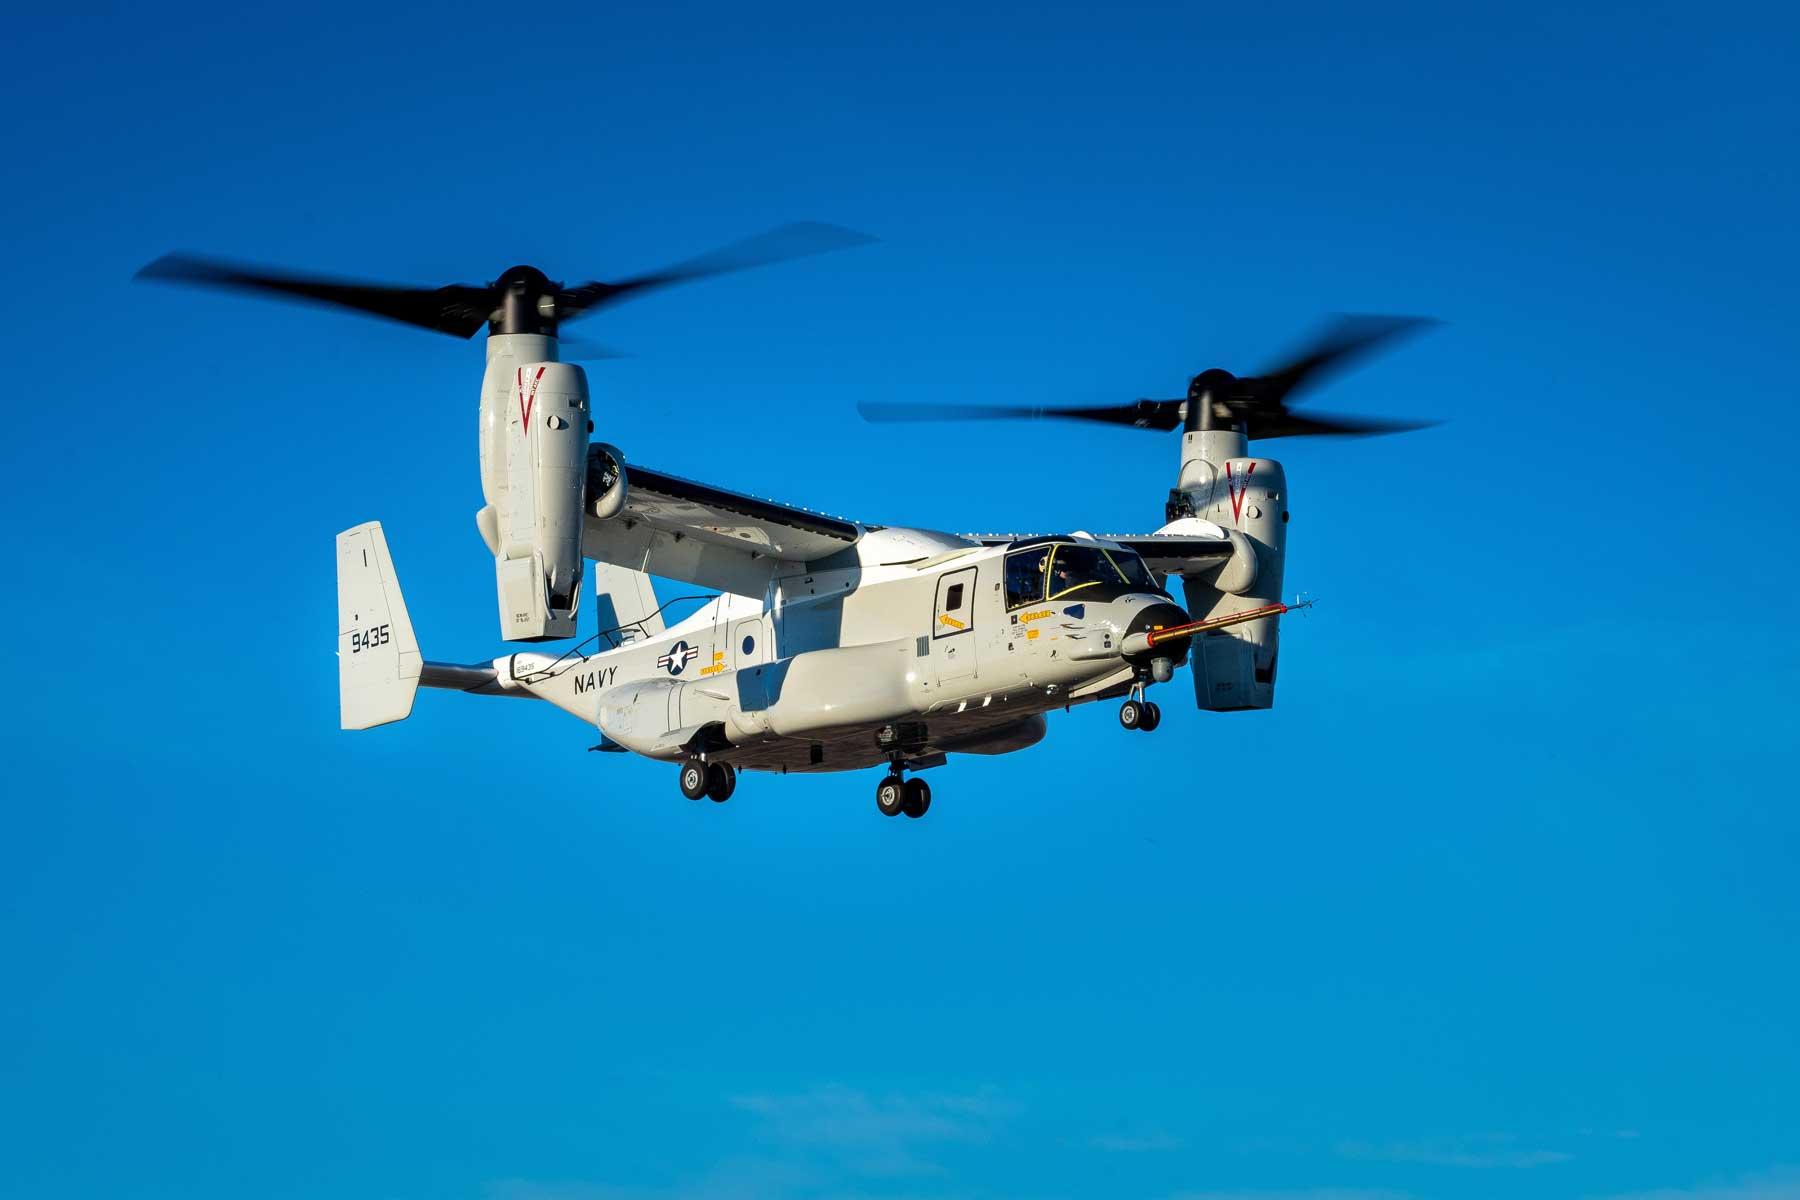 V 22 Osprey Designed For The Navy Makes First Flight